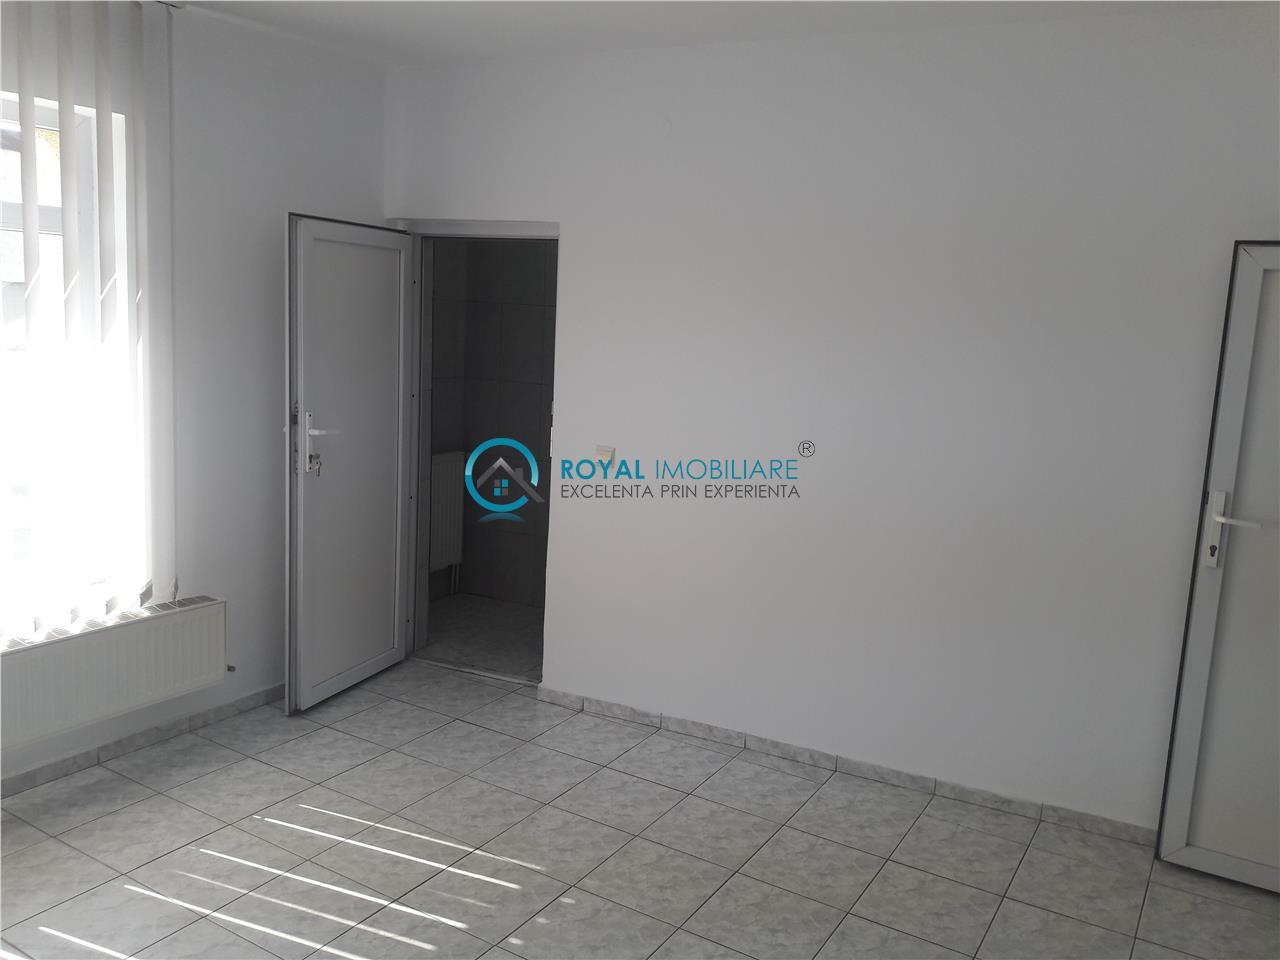 Royal Imobiliare   Inchirieri Birouri zona Gheorghe Doja